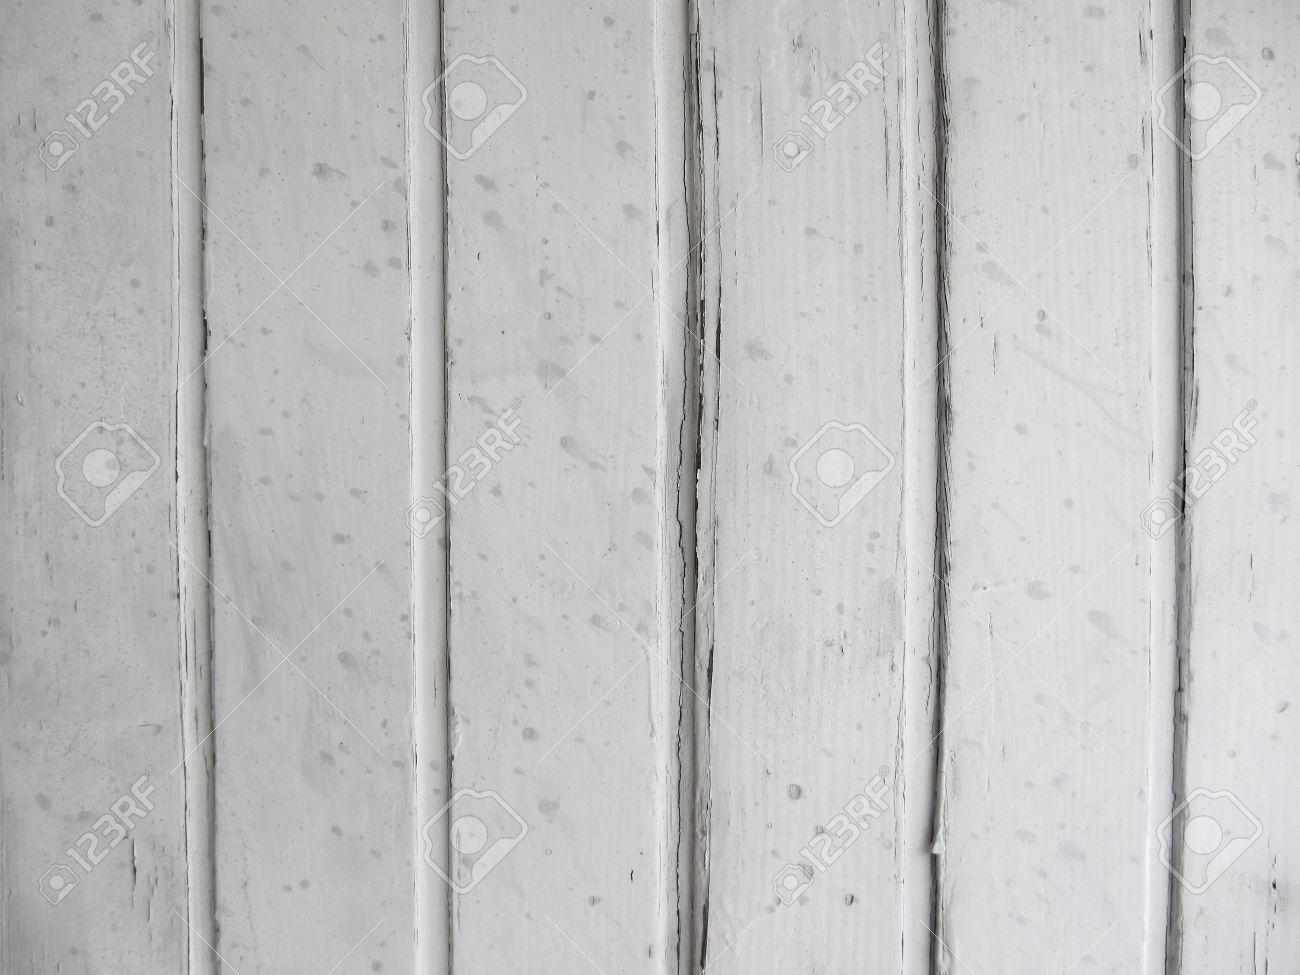 white wood door texture. Old Varnished Grey Wooden Barn Door Texture Stock Photo - 46716003 White Wood T